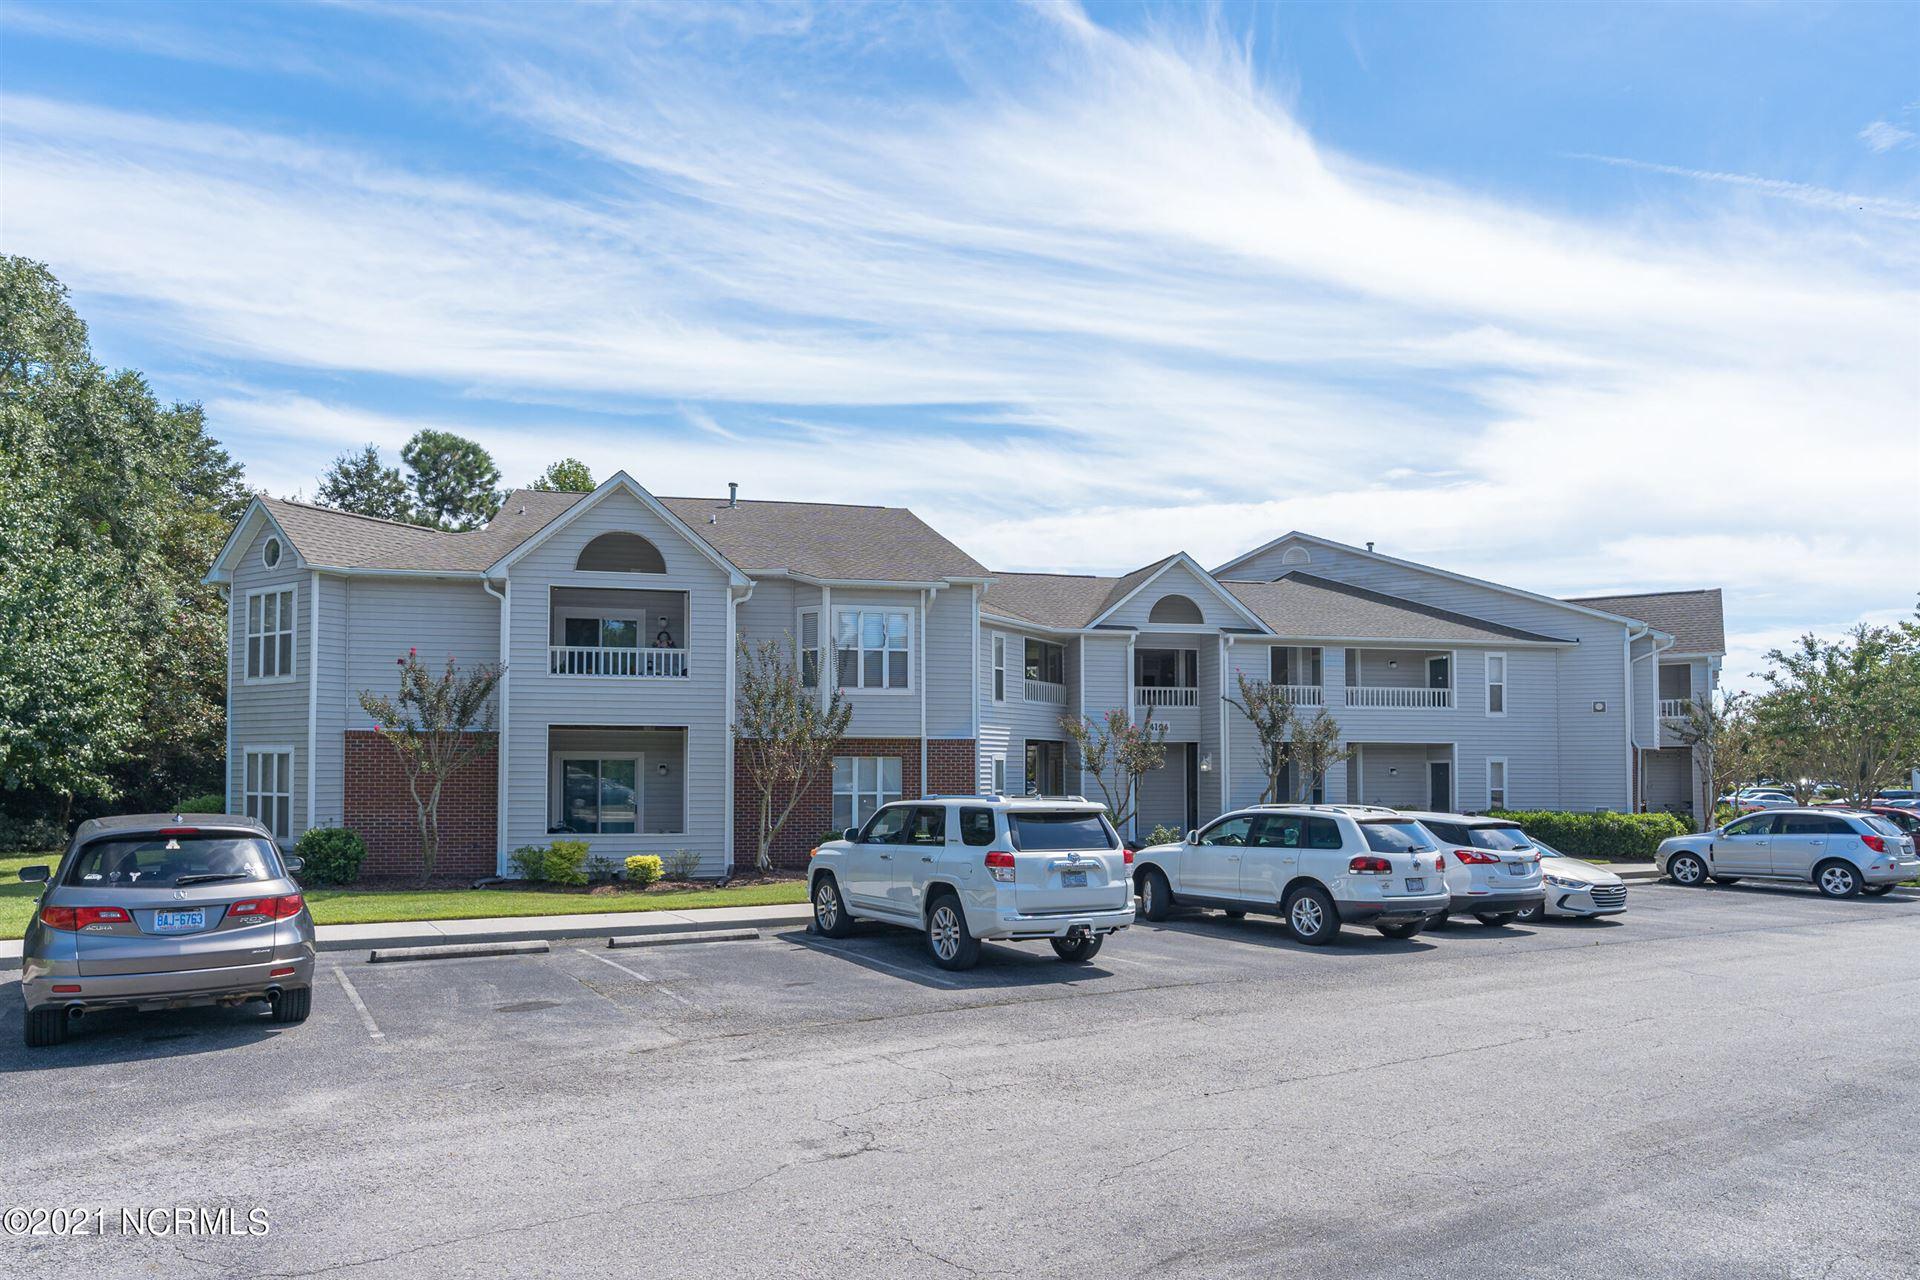 Photo of 4104 Breezewood Drive #Apt 203, Wilmington, NC 28412 (MLS # 100290340)